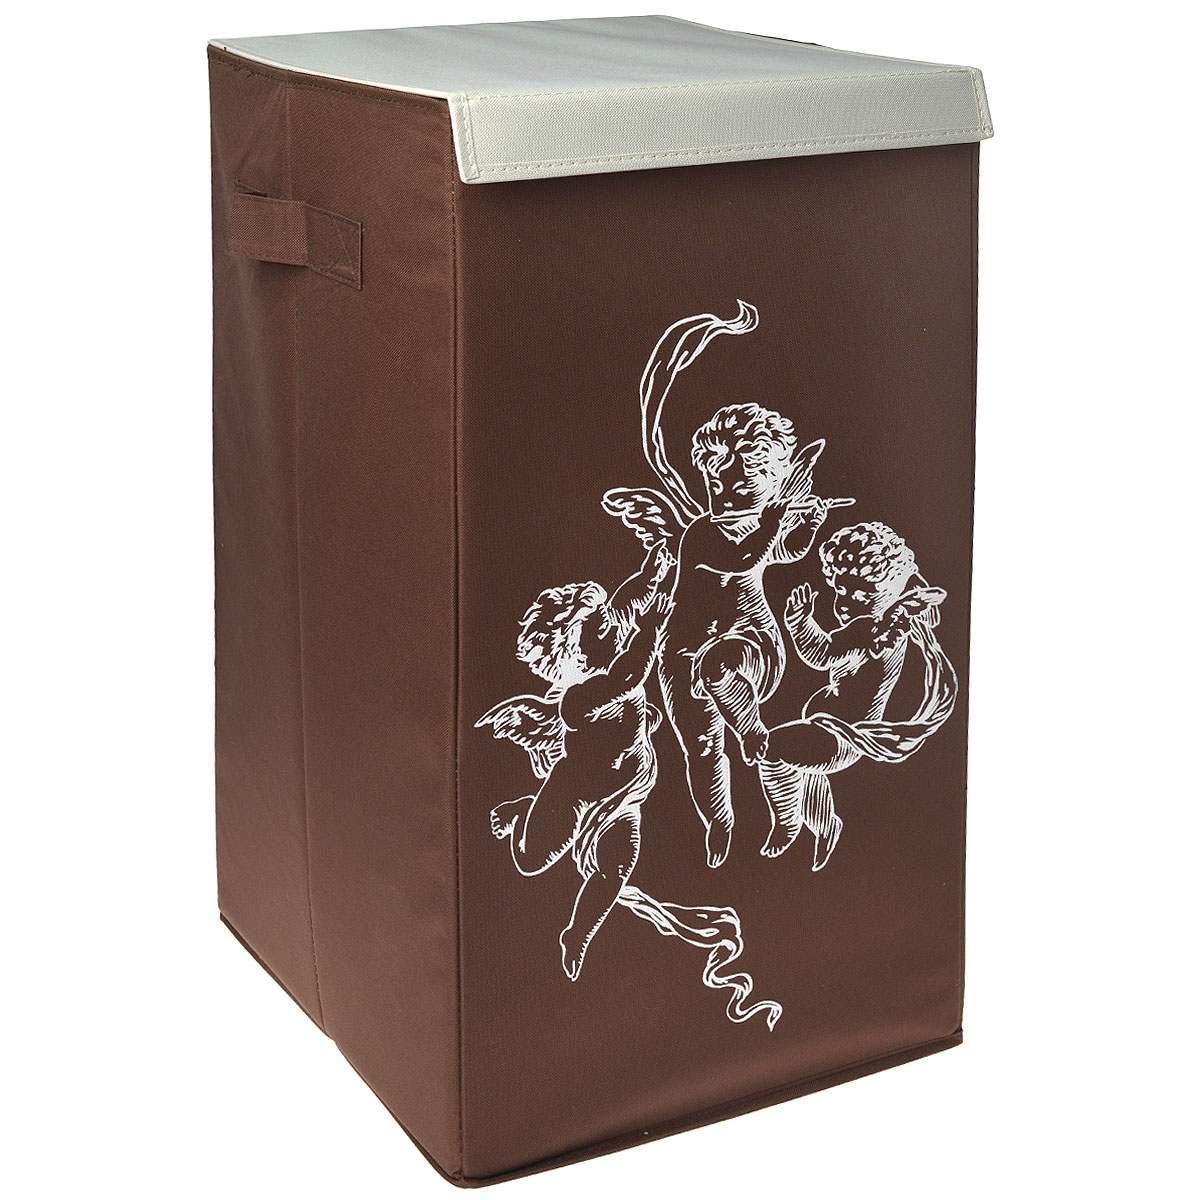 Корзина для белья Hausmann, цвет: коричневый, 35 x 35 x 64 см корзина для белья hausmann полиэстер